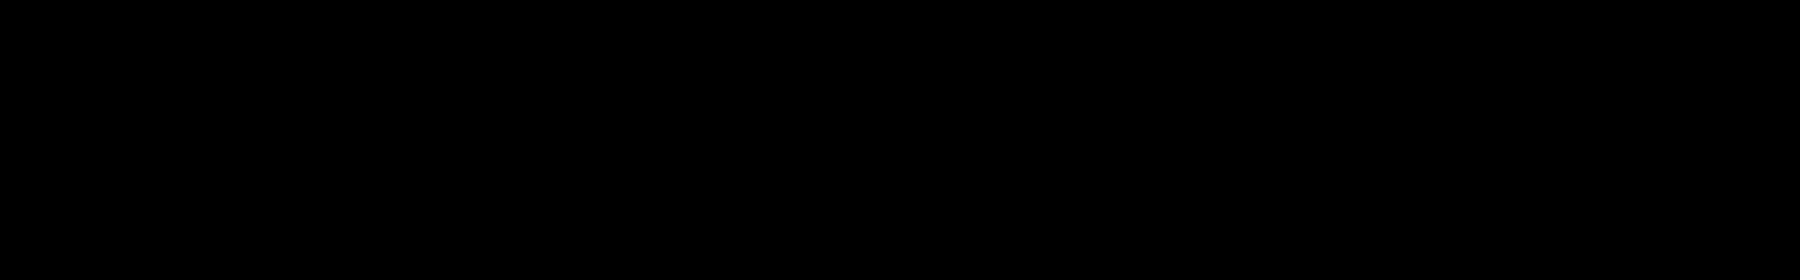 Thunderbolt [Melodic Techno Ableton Template] audio waveform